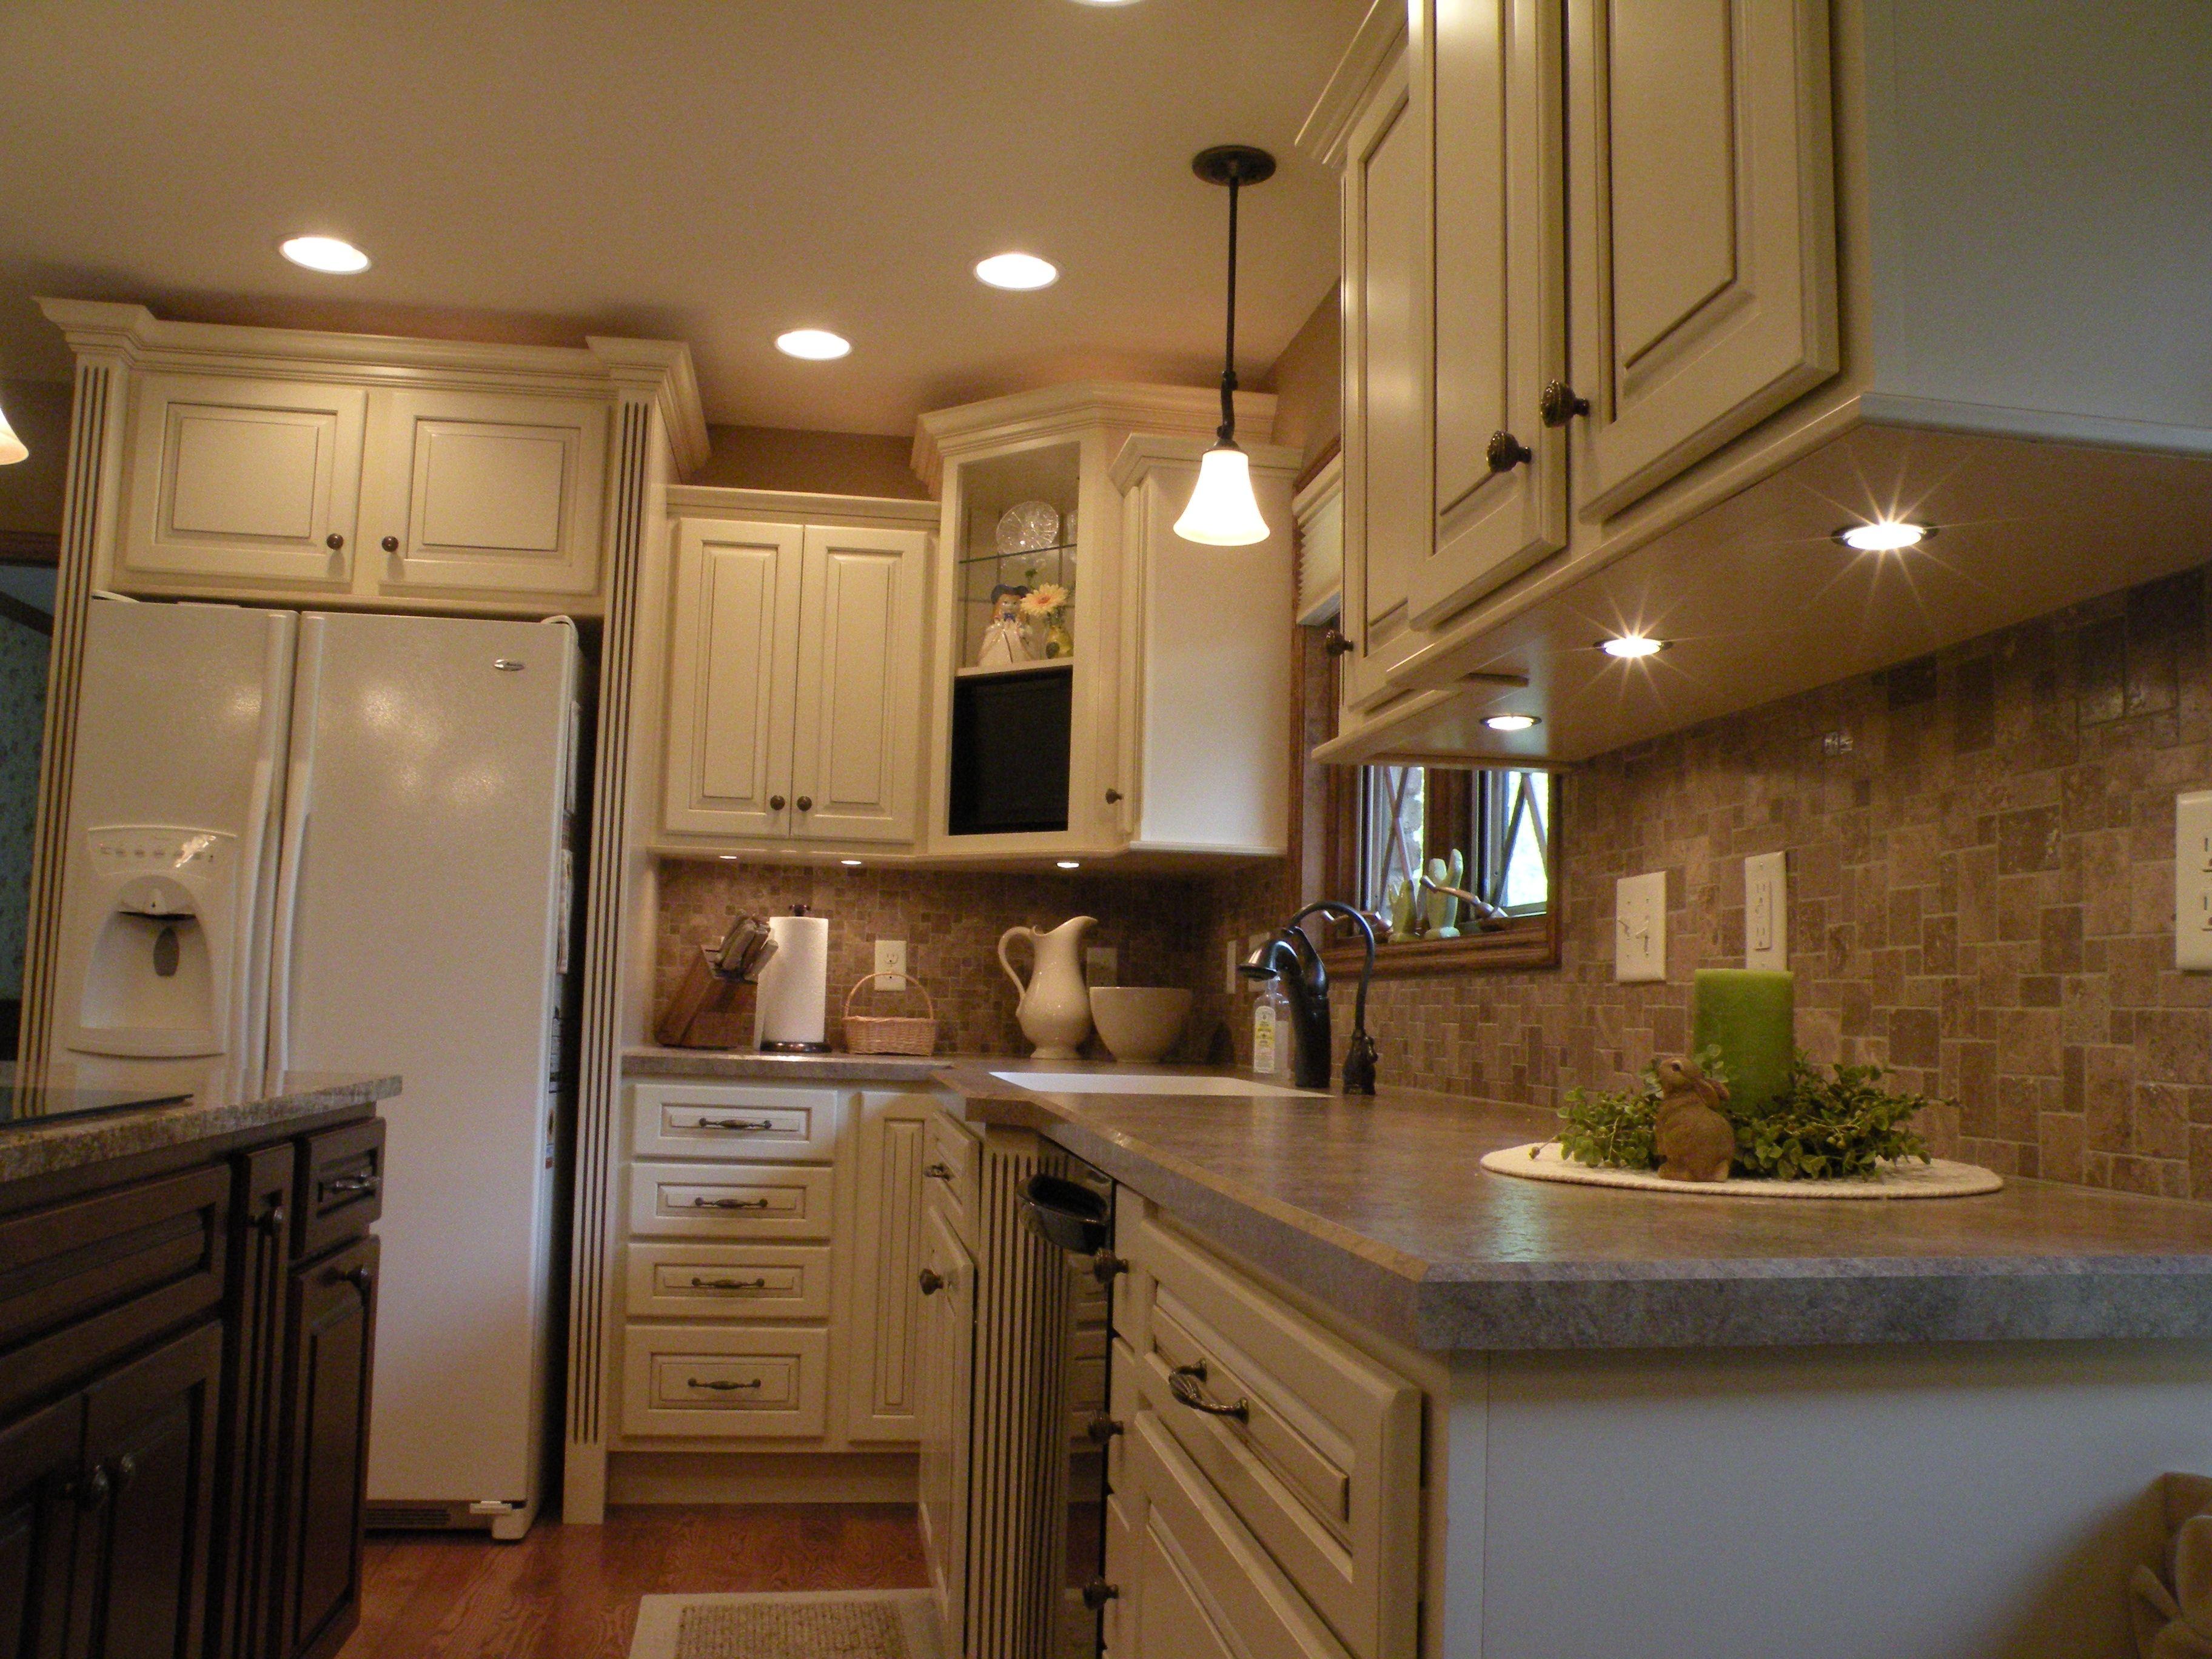 Kraftmaid Kitchen Cabinets Sizes | http://garecscleaningsystems.net ...